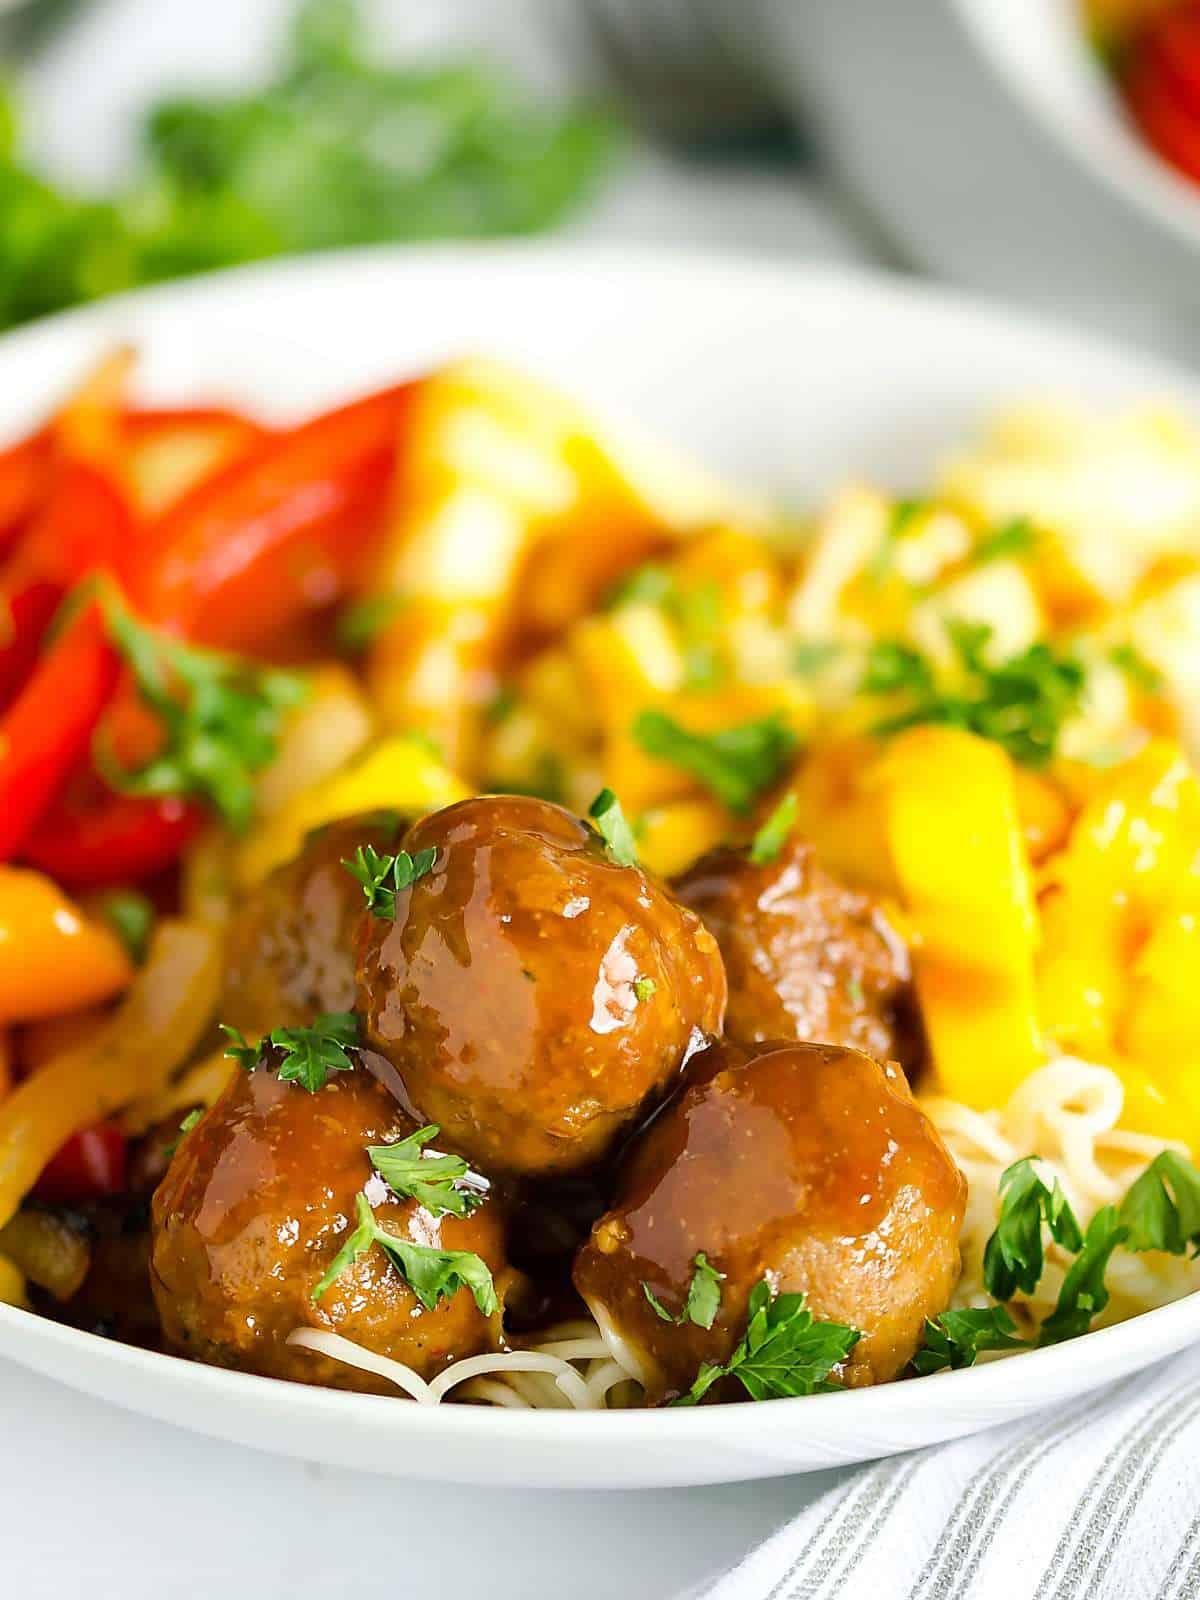 Hawaiian style meatballs - quick dinner solutions